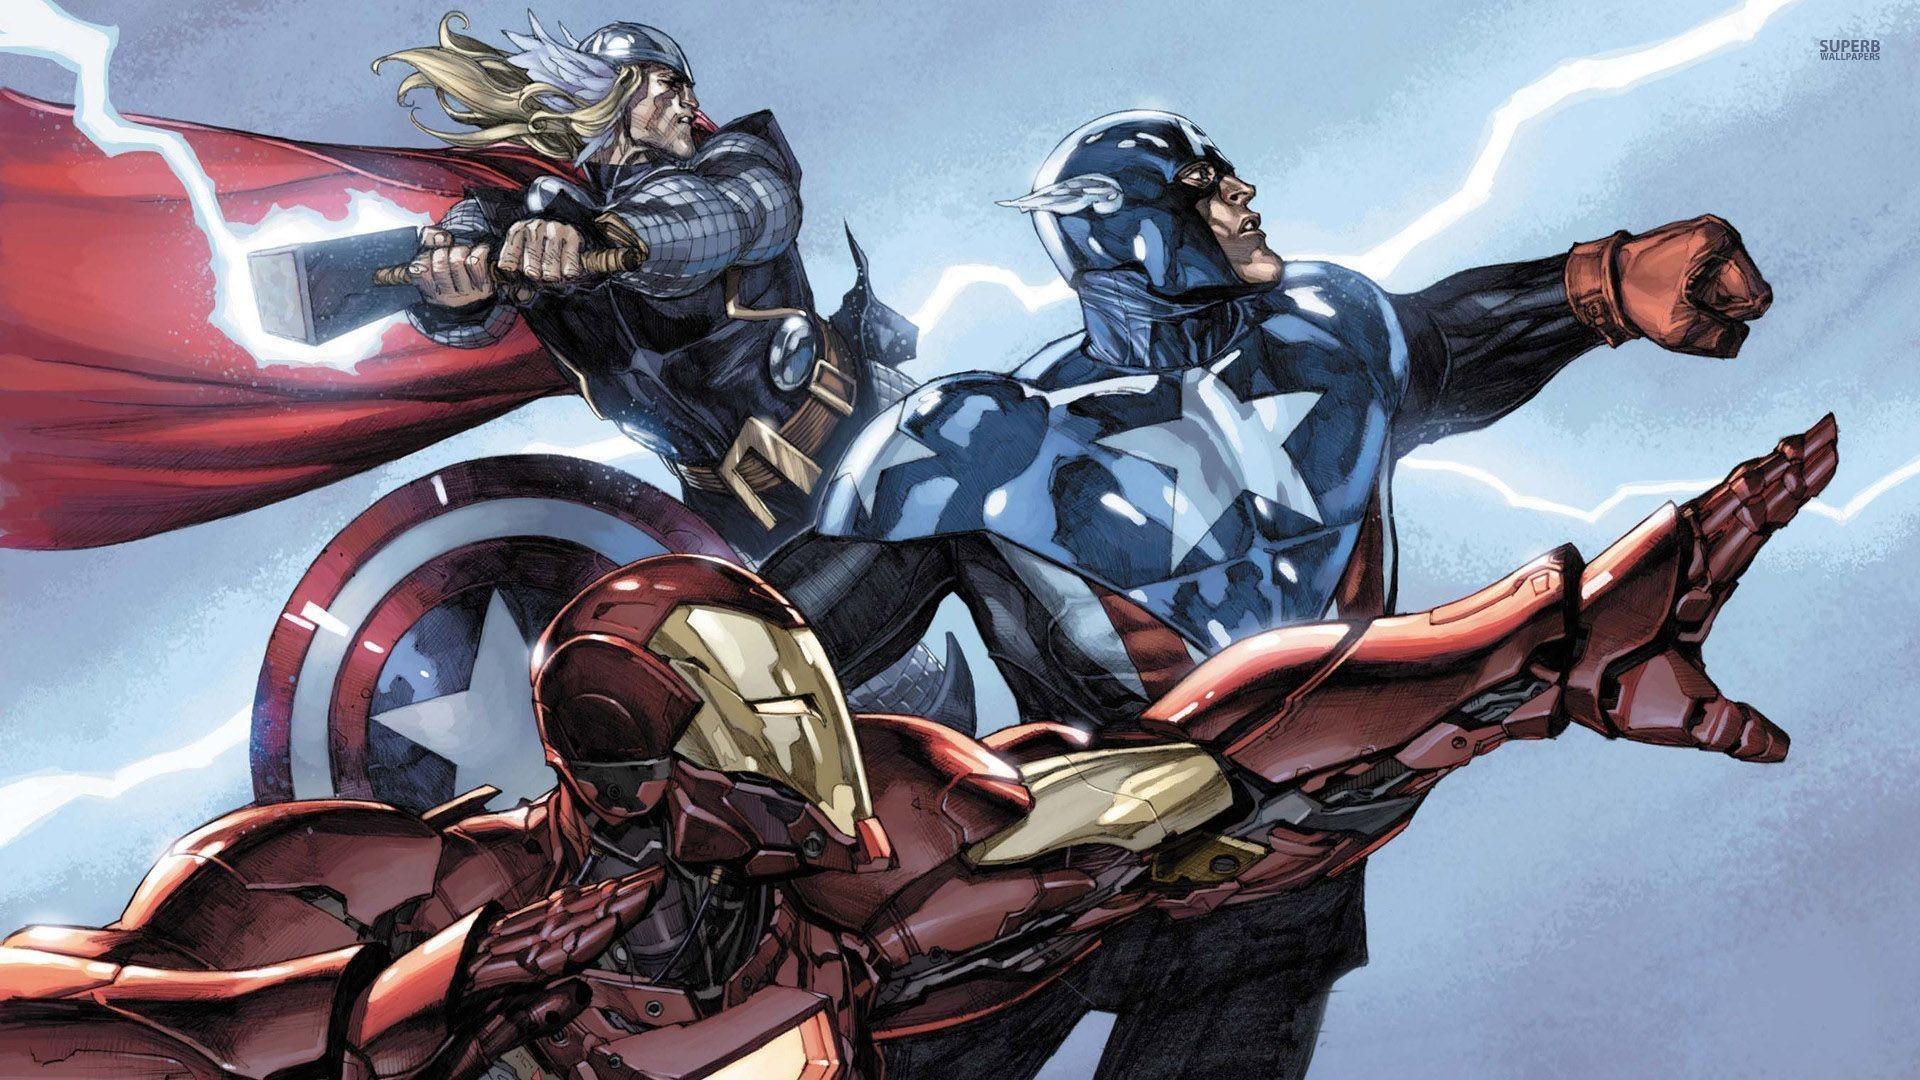 thor-captain-america-and-iron-man-29376-1920×1080.